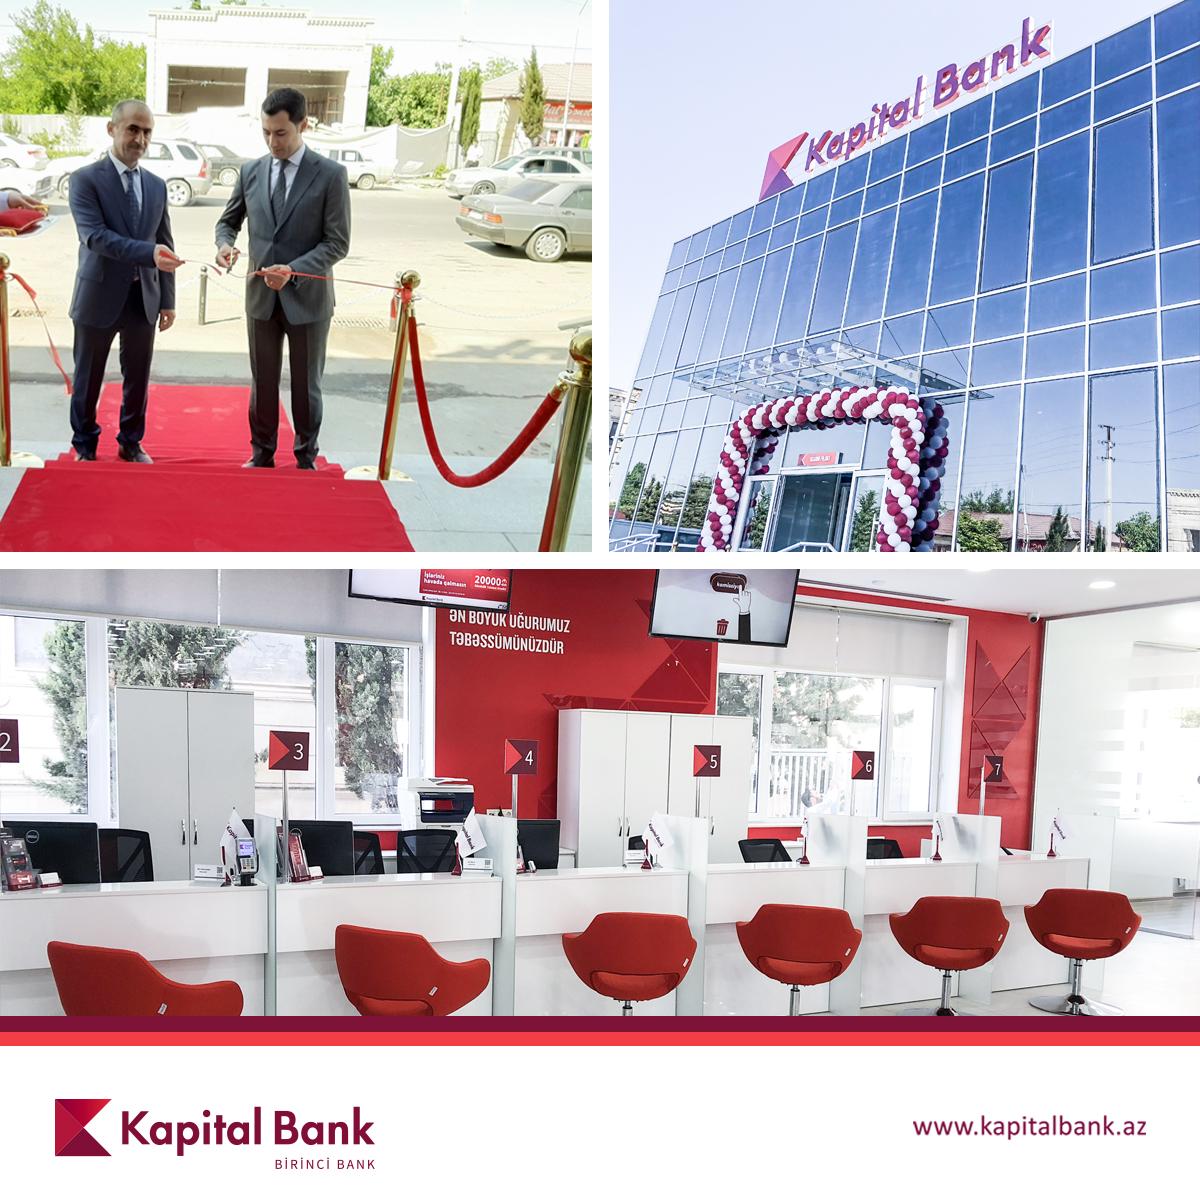 Kapital Bank представил обновленный филиал в Агдаме